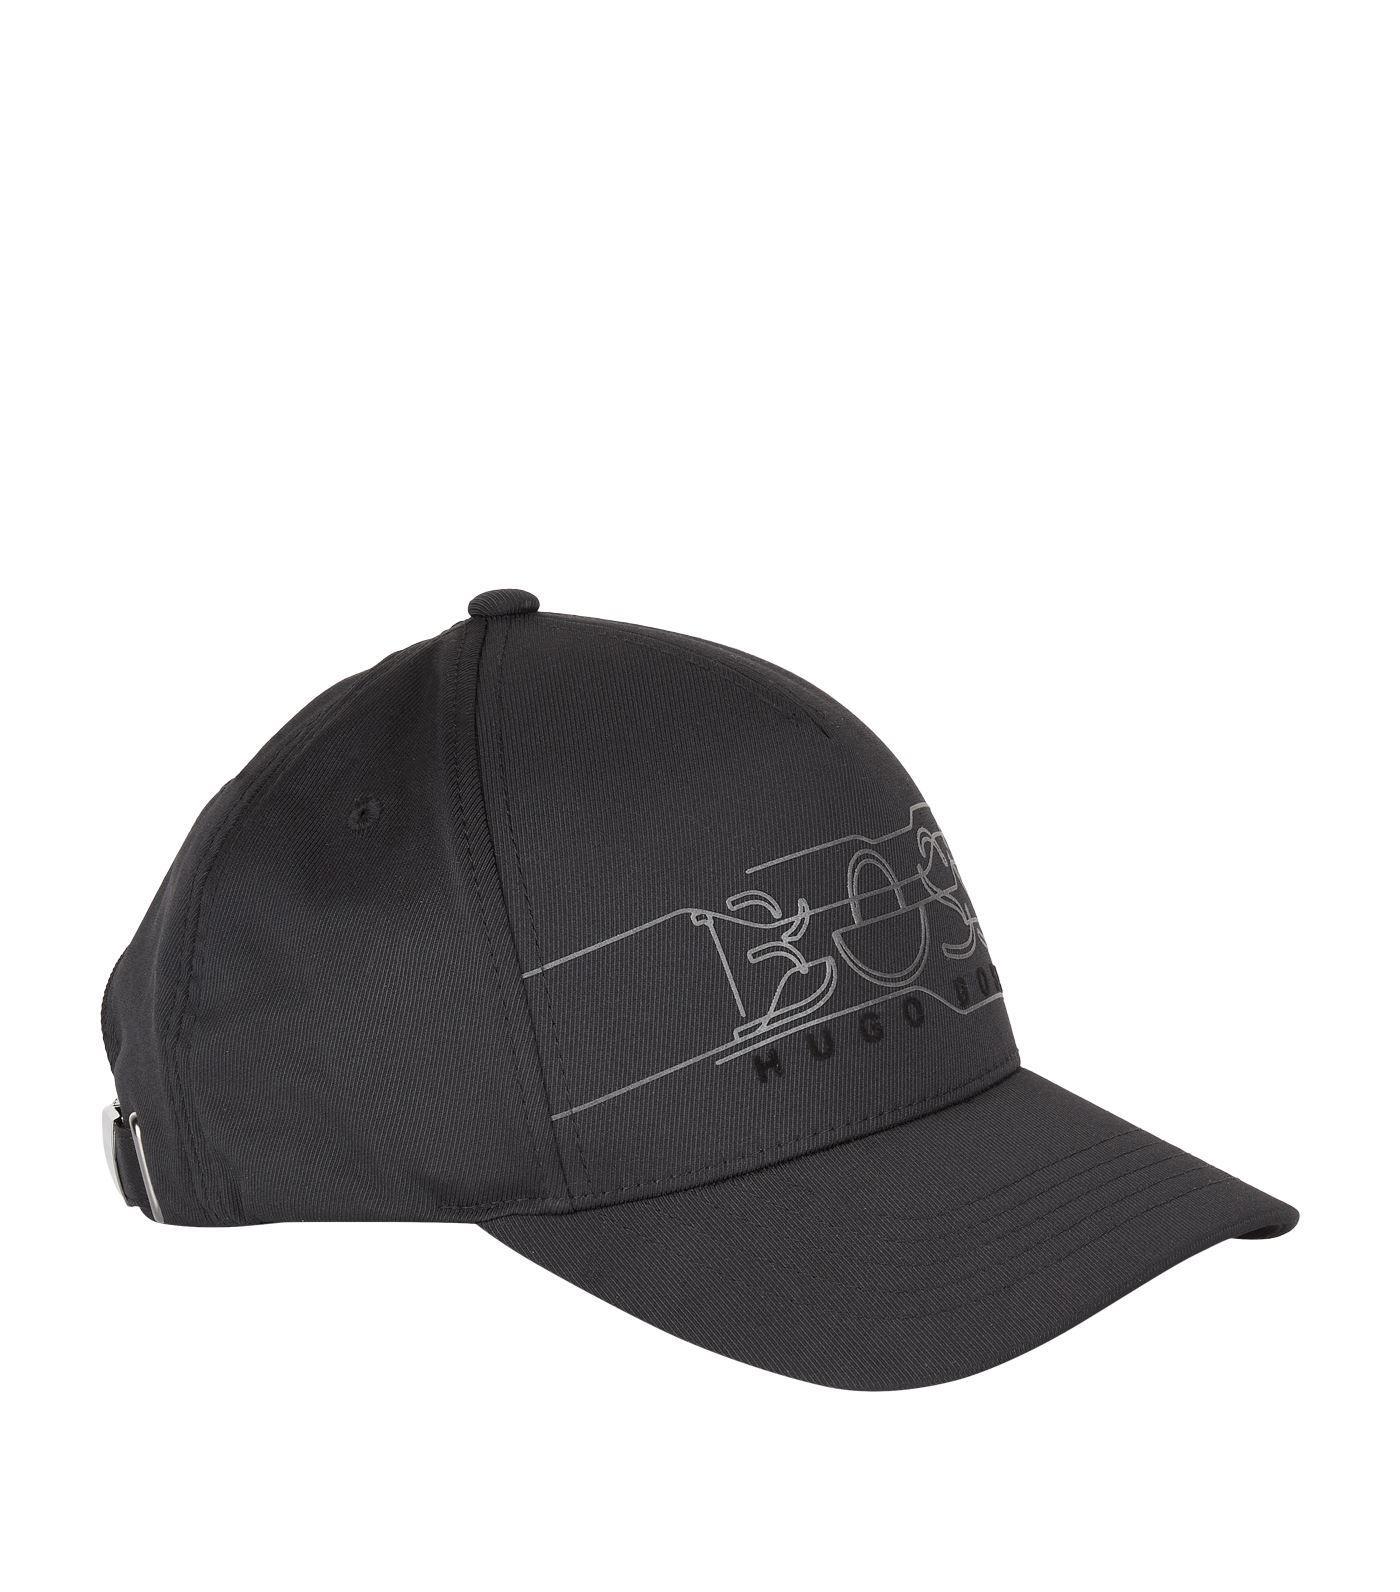 b88fdd70988 Lyst - BOSS Reflective Logo Cap in Black for Men